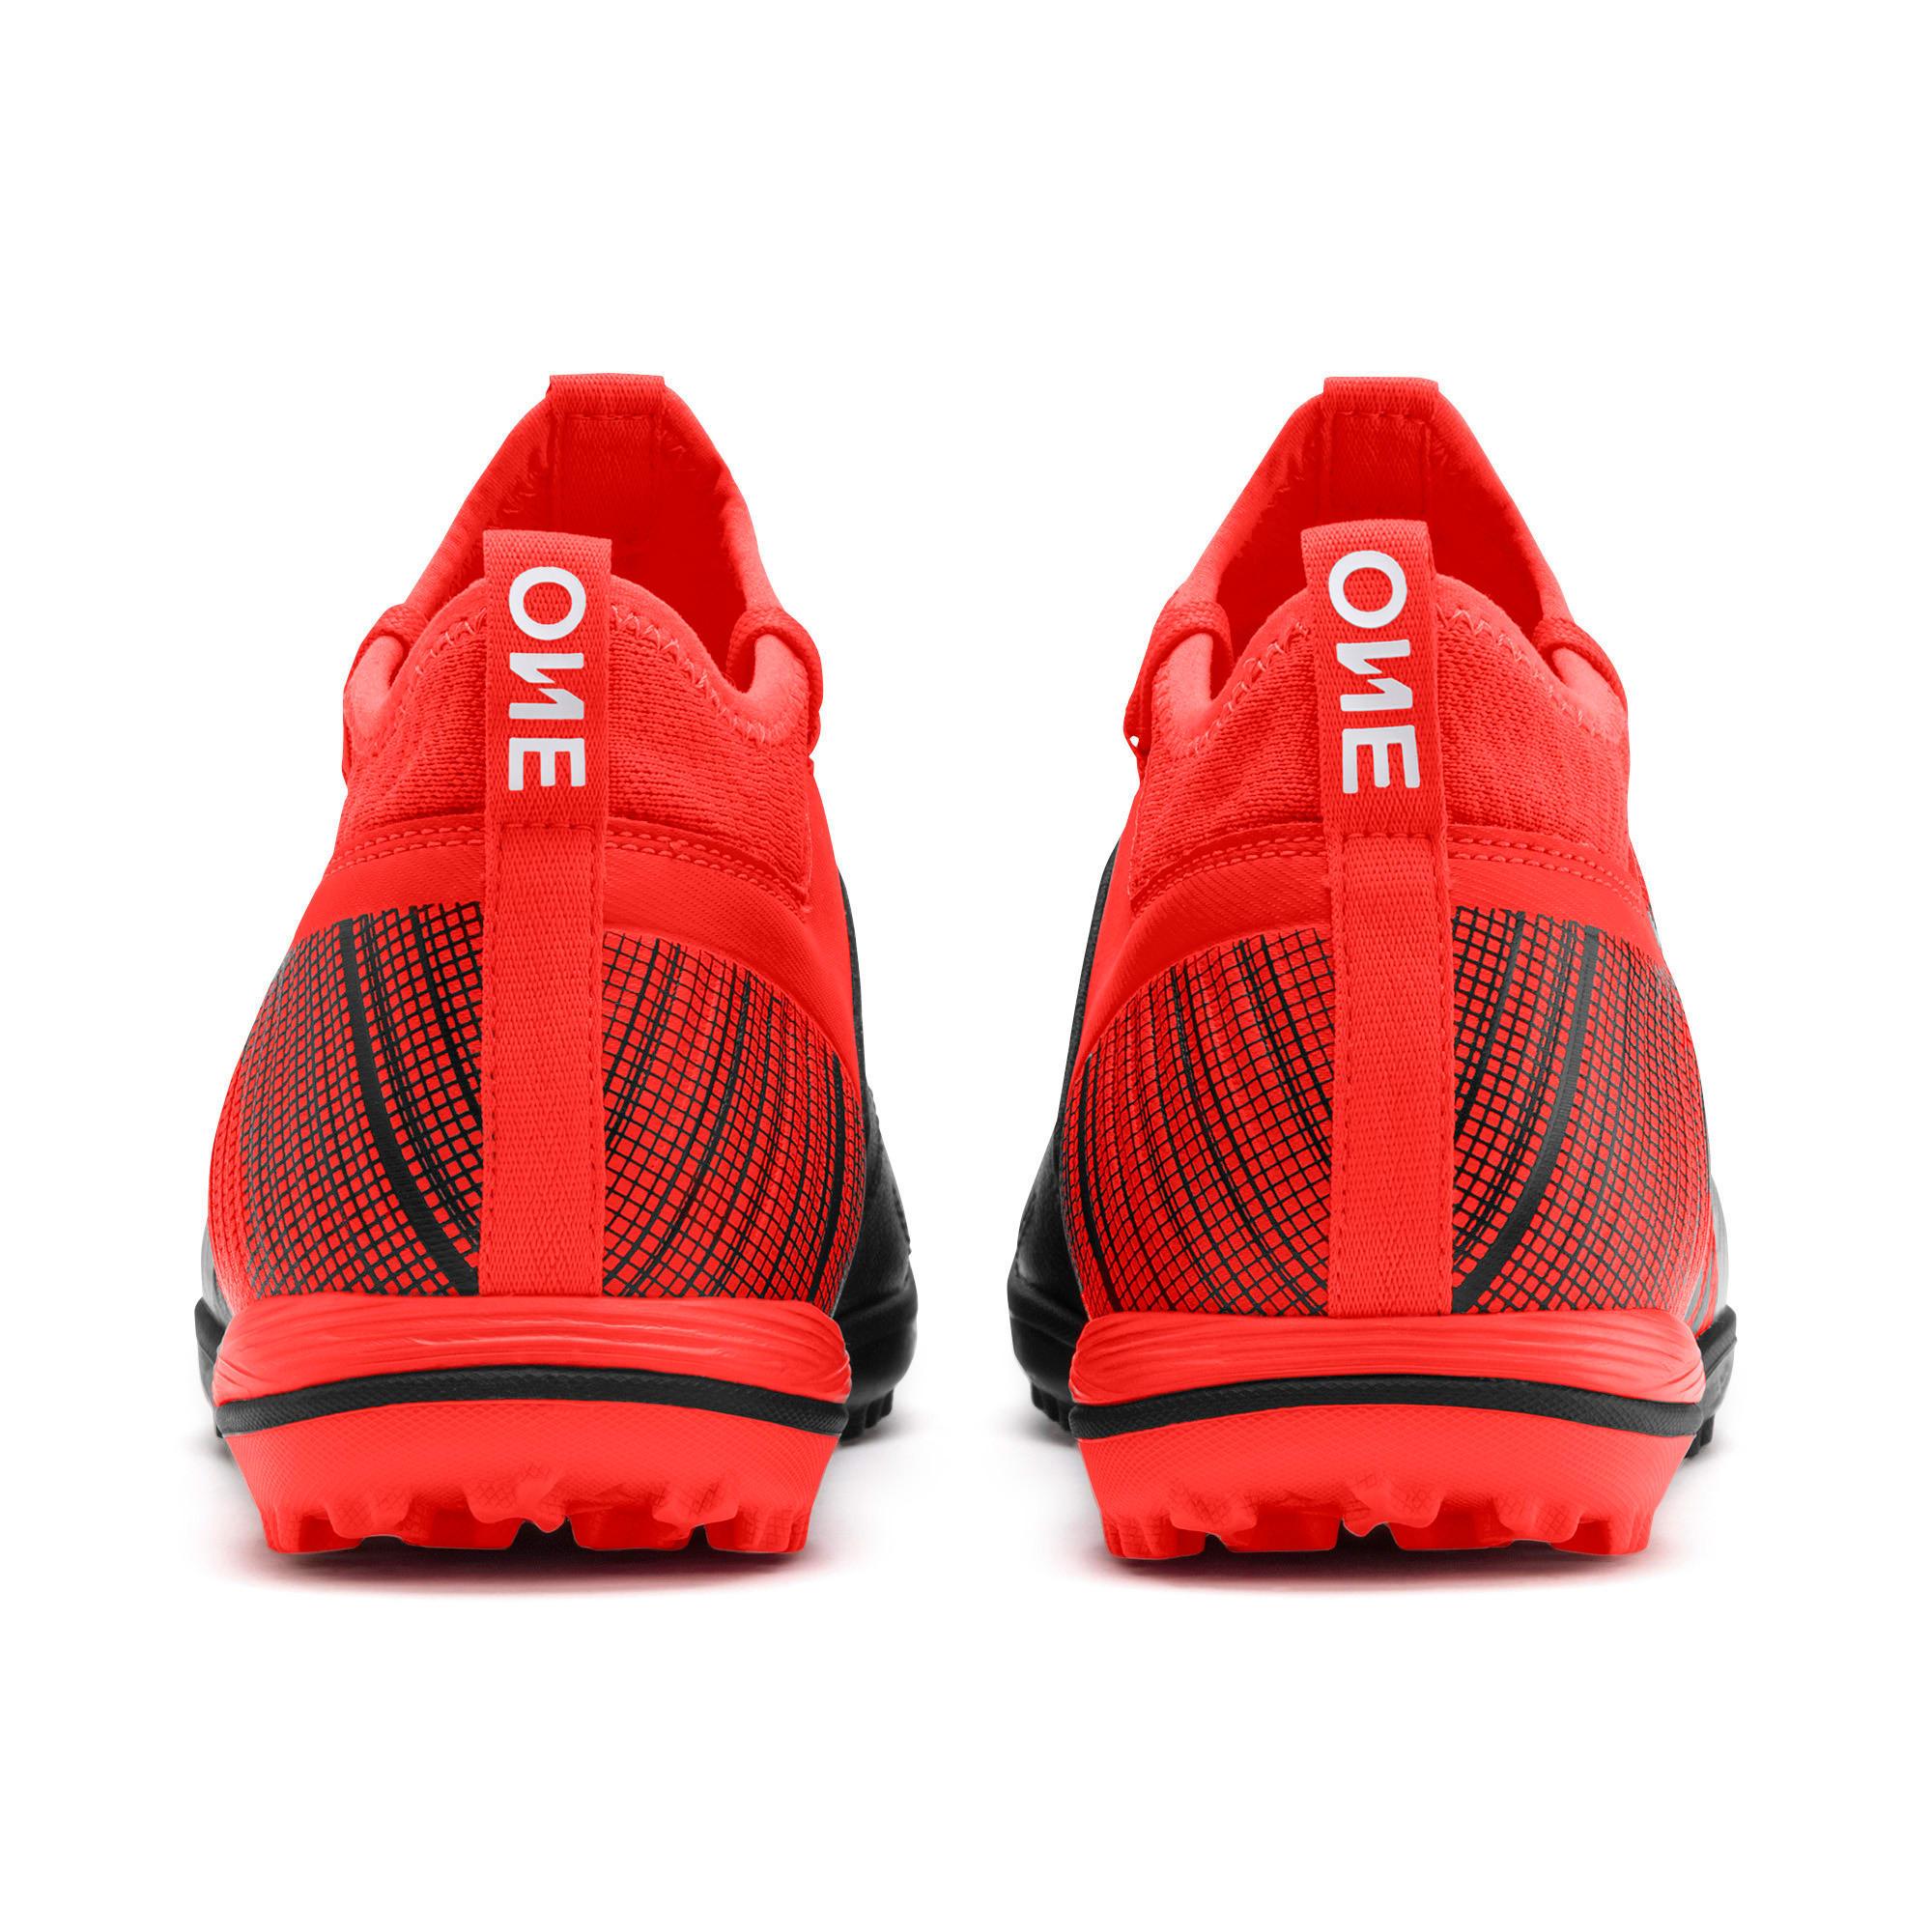 Thumbnail 4 of PUMA ONE 5.3 TT Men's Soccer Shoes, Black-Nrgy Red-Aged Silver, medium